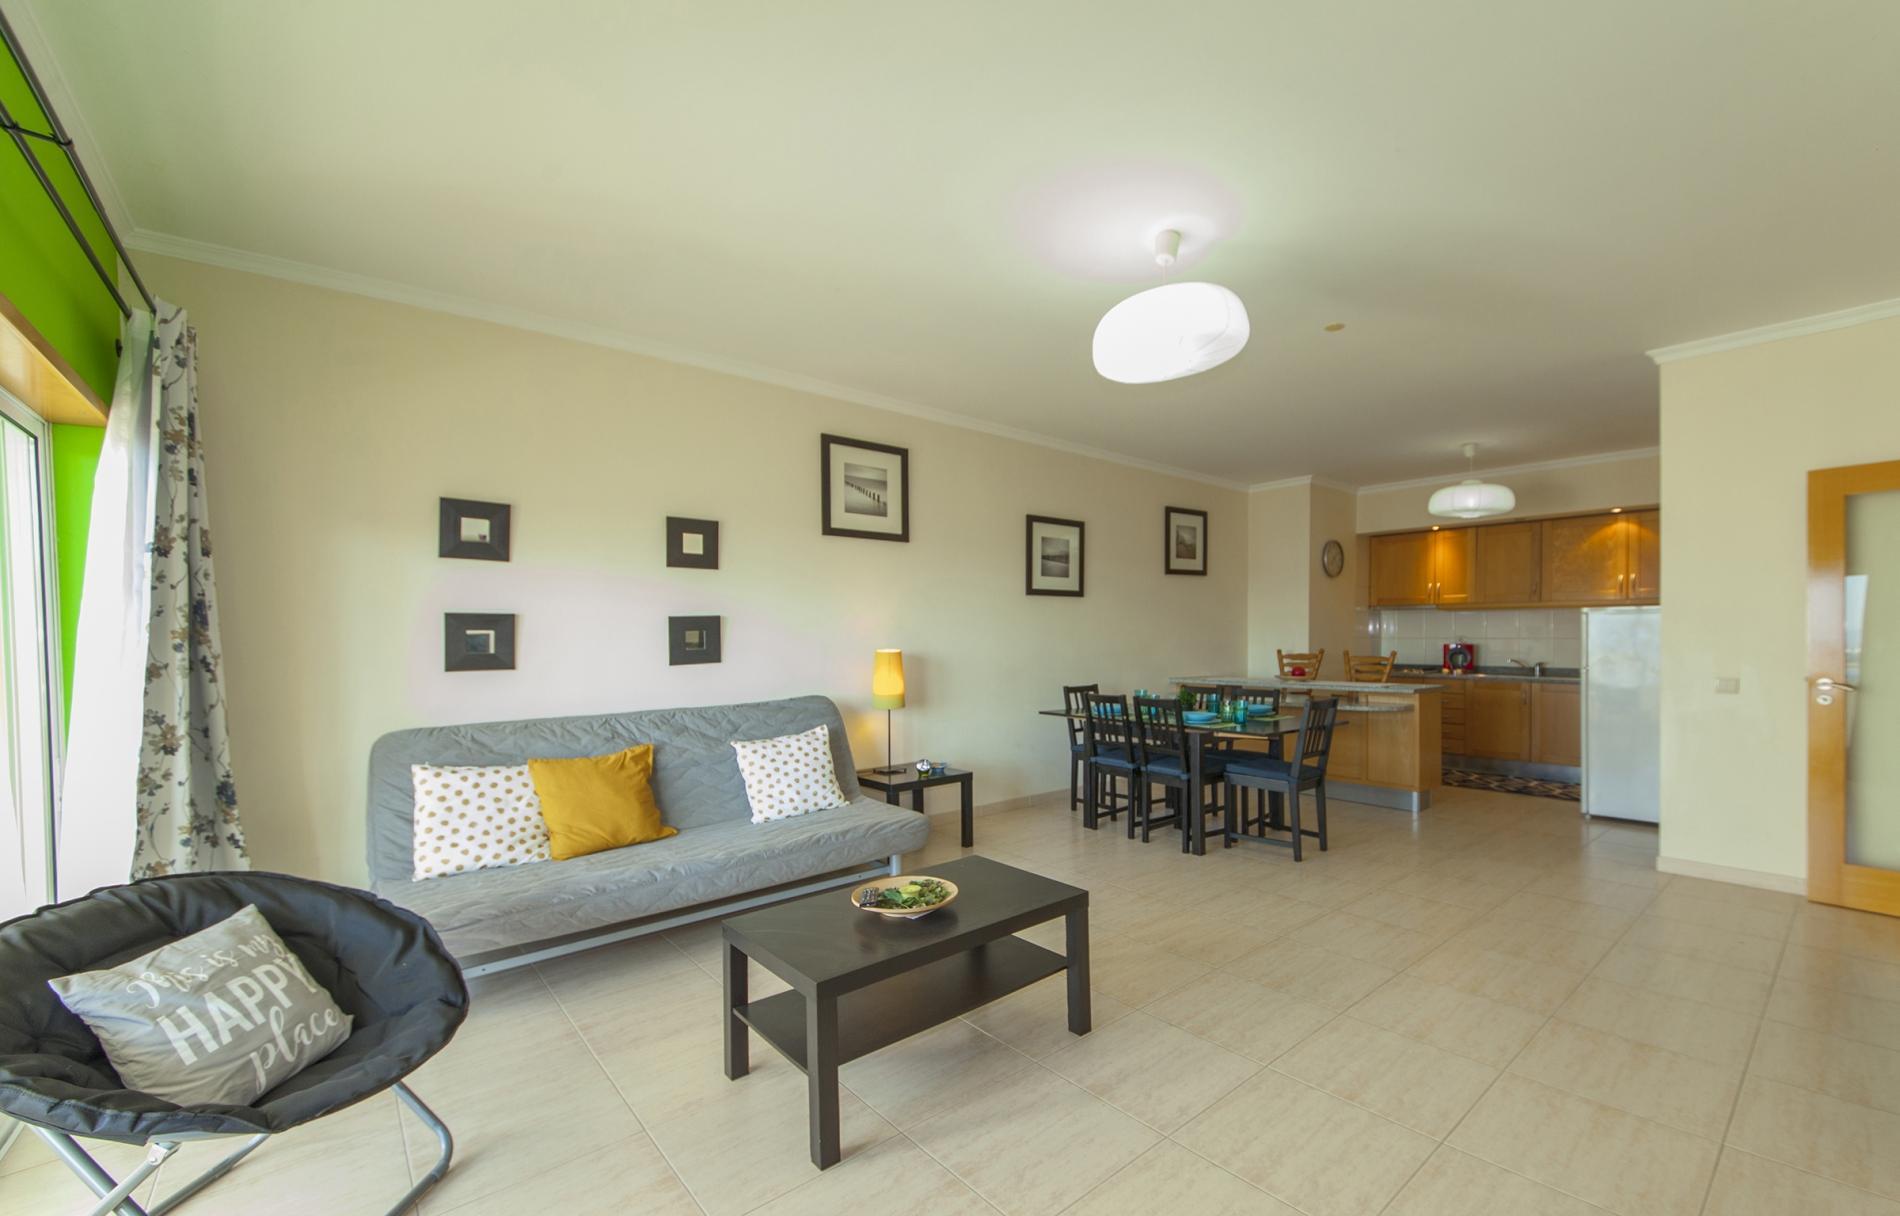 B44 - Alto do Quintao Central Apartment photo 22522529